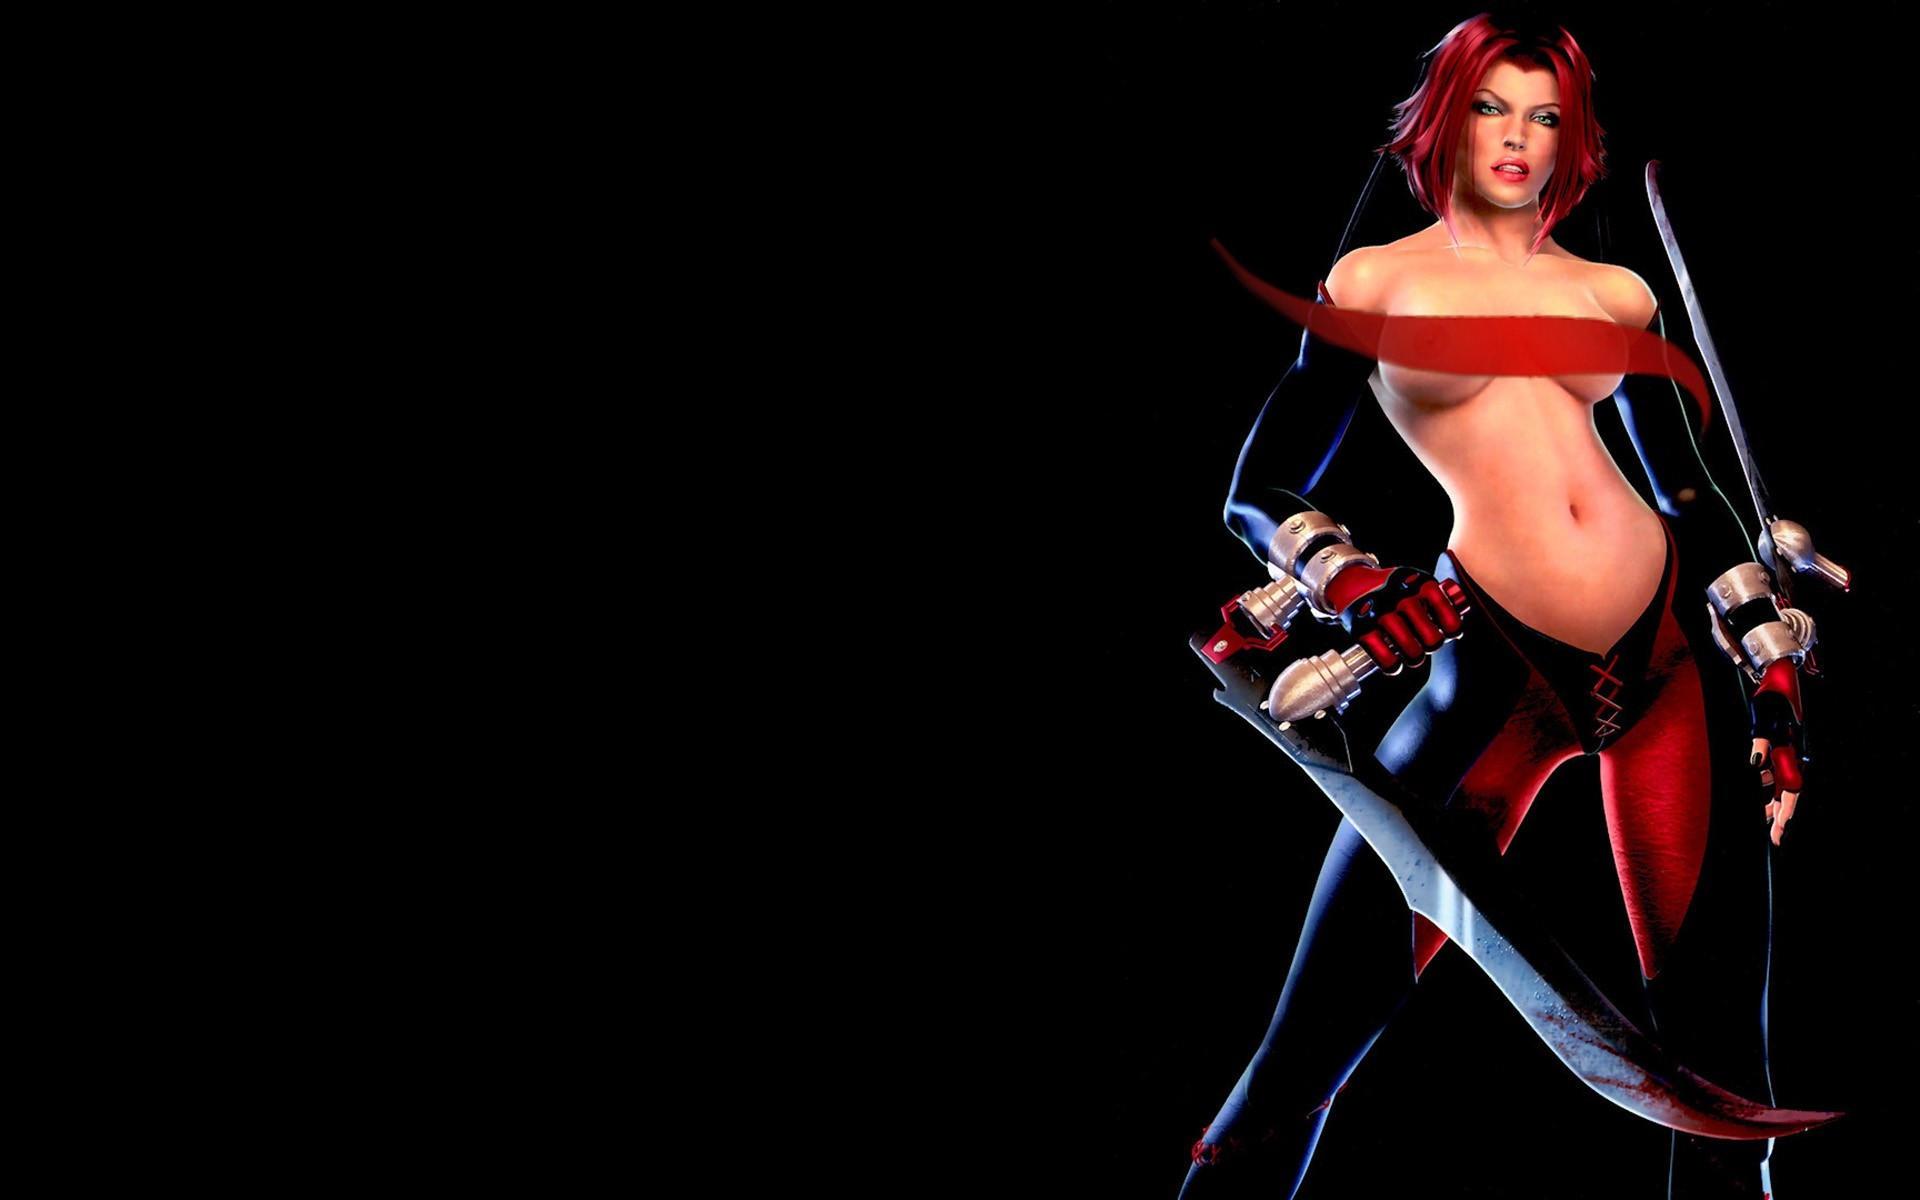 Эротические онлайн игры играйте в эротические и порно игры онлайн 16 фотография